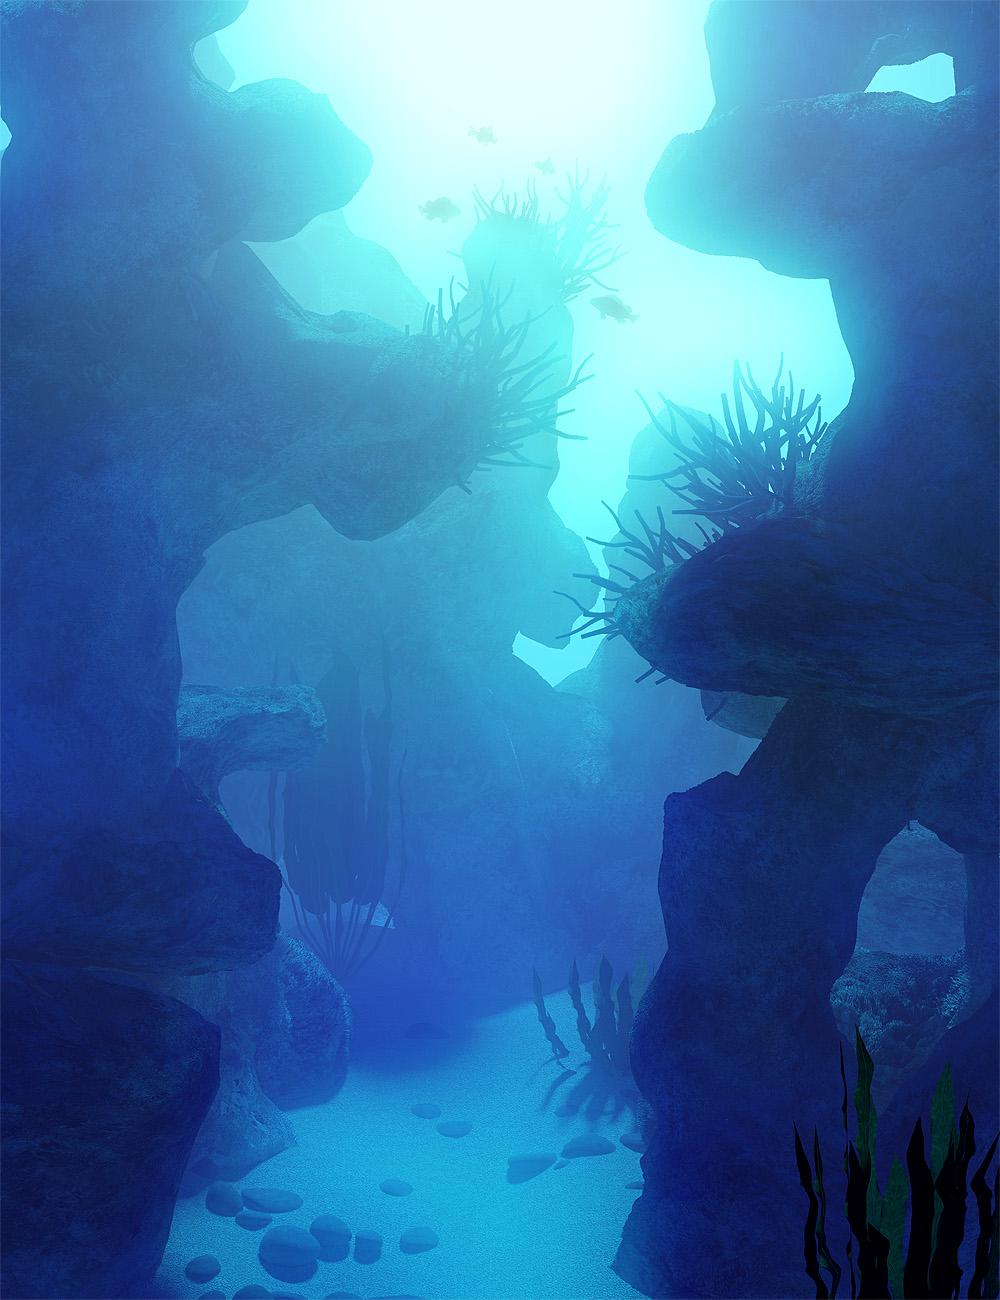 Gardens of Poseidon - Reef Rocks by: Orestes Graphics, 3D Models by Daz 3D